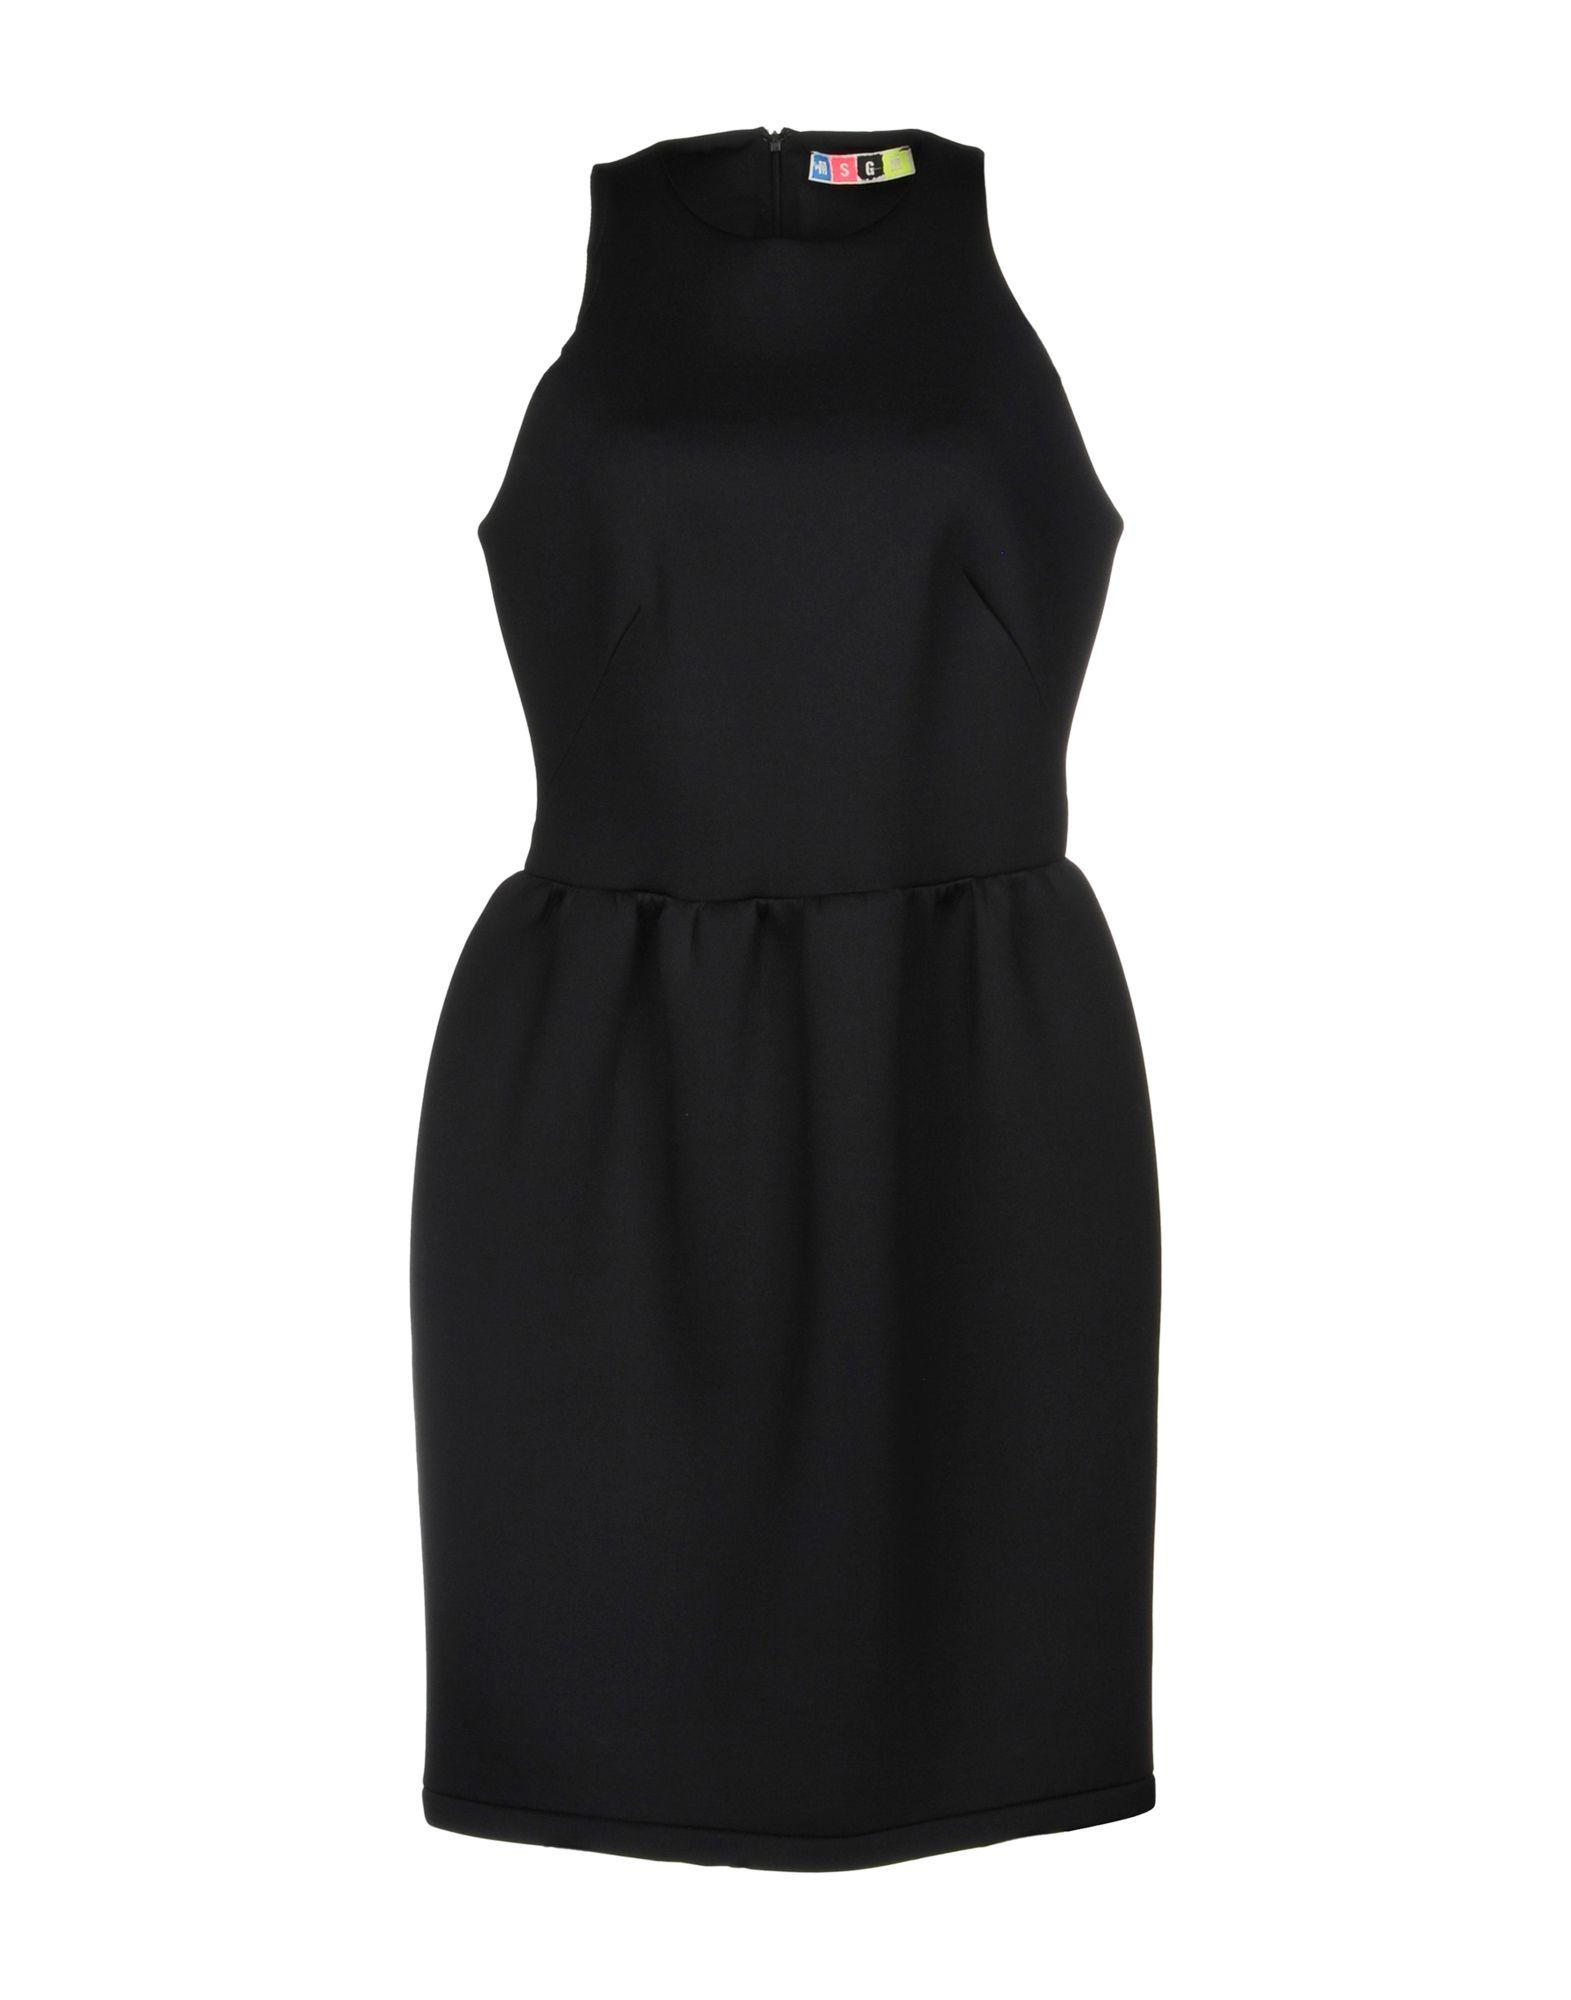 MSGM Black Neoprene Sleeveless Dress